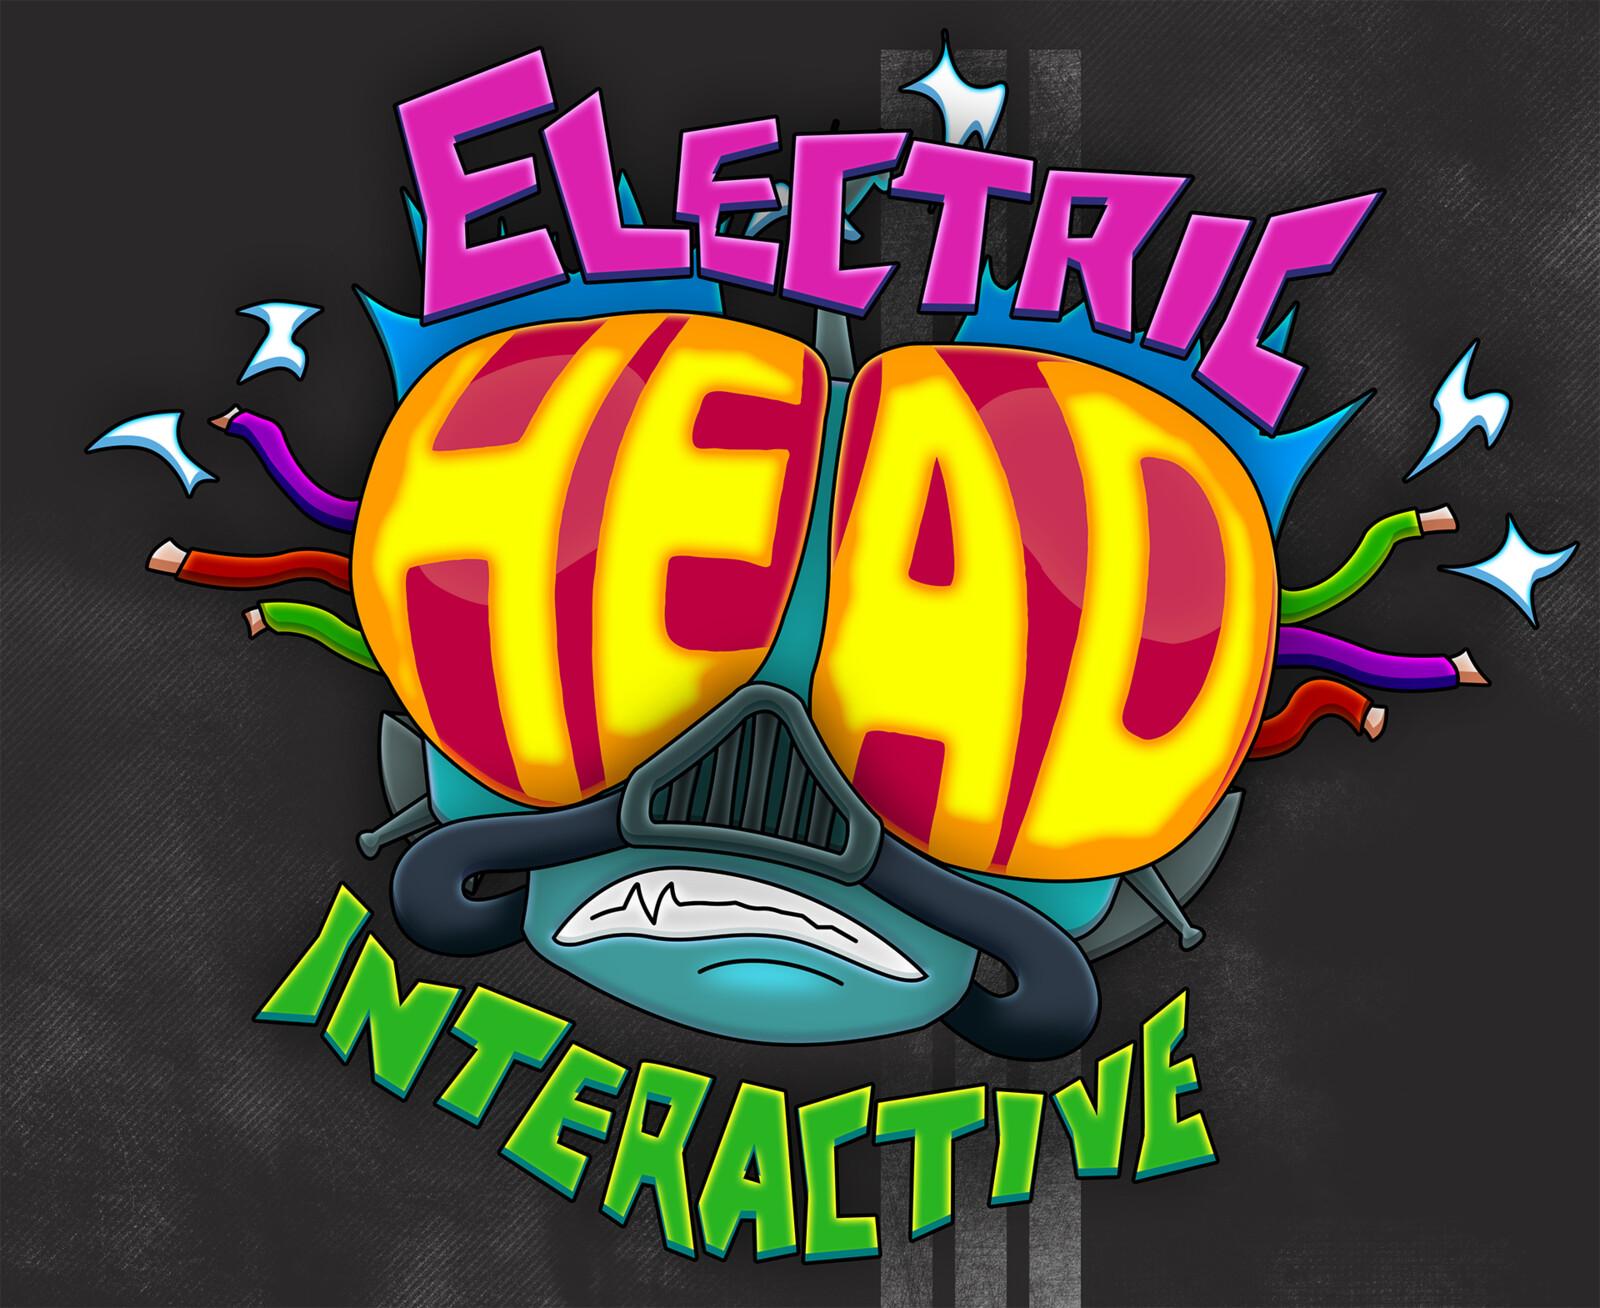 Electric Head Interactive Graphics